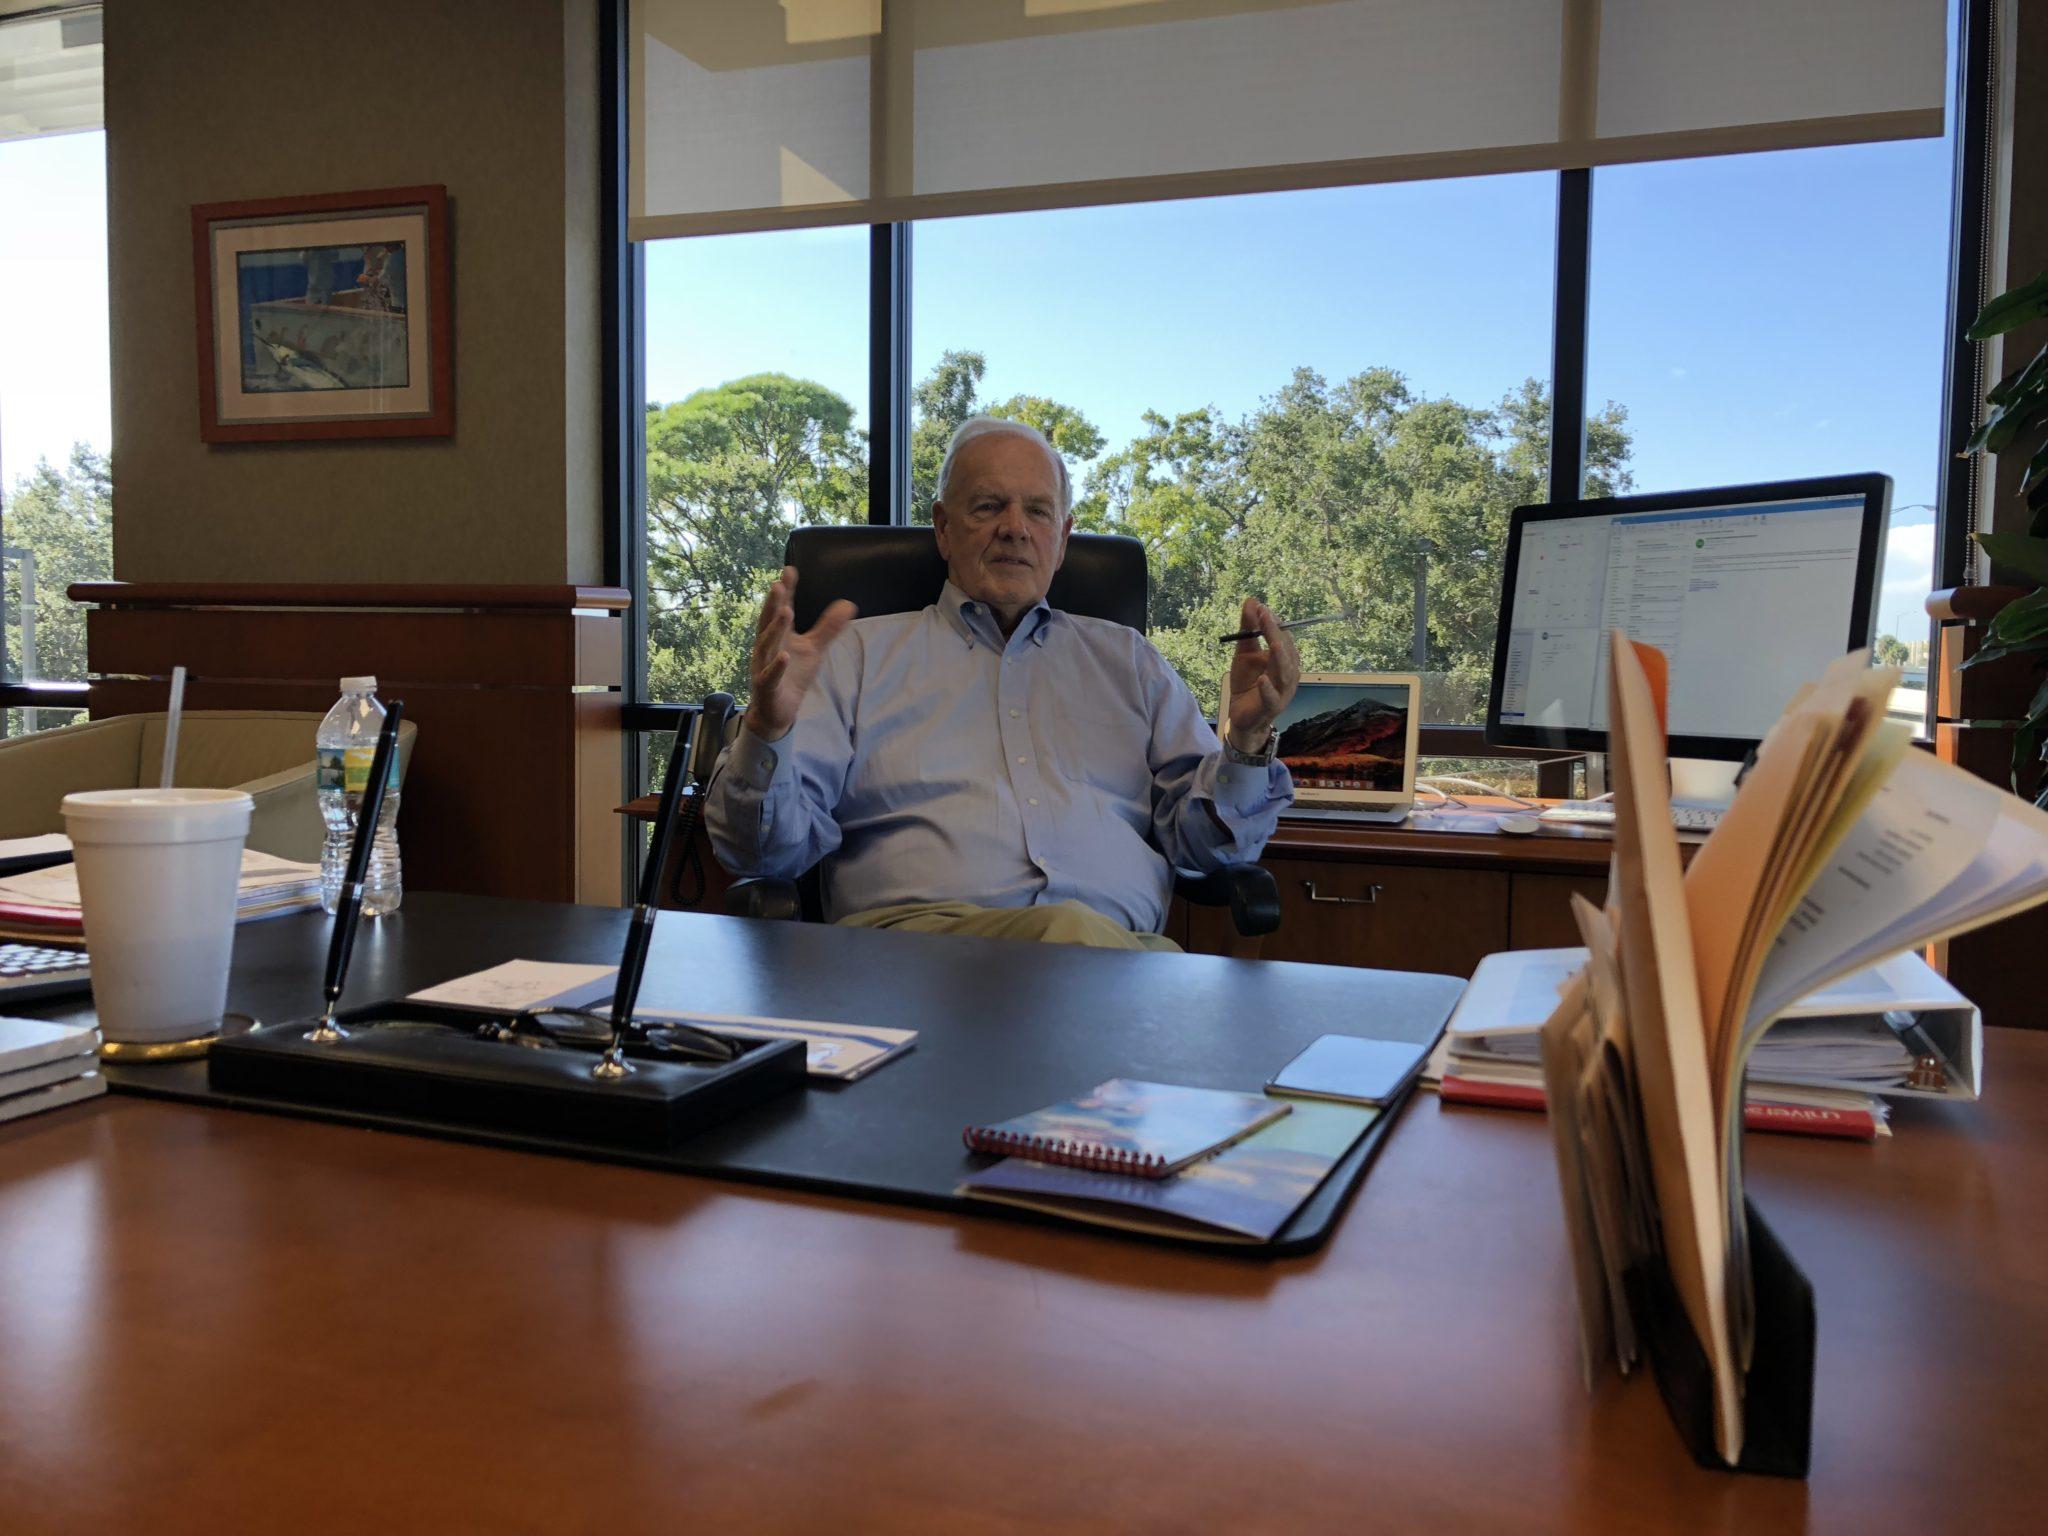 Dan Doyle Sr. at desk